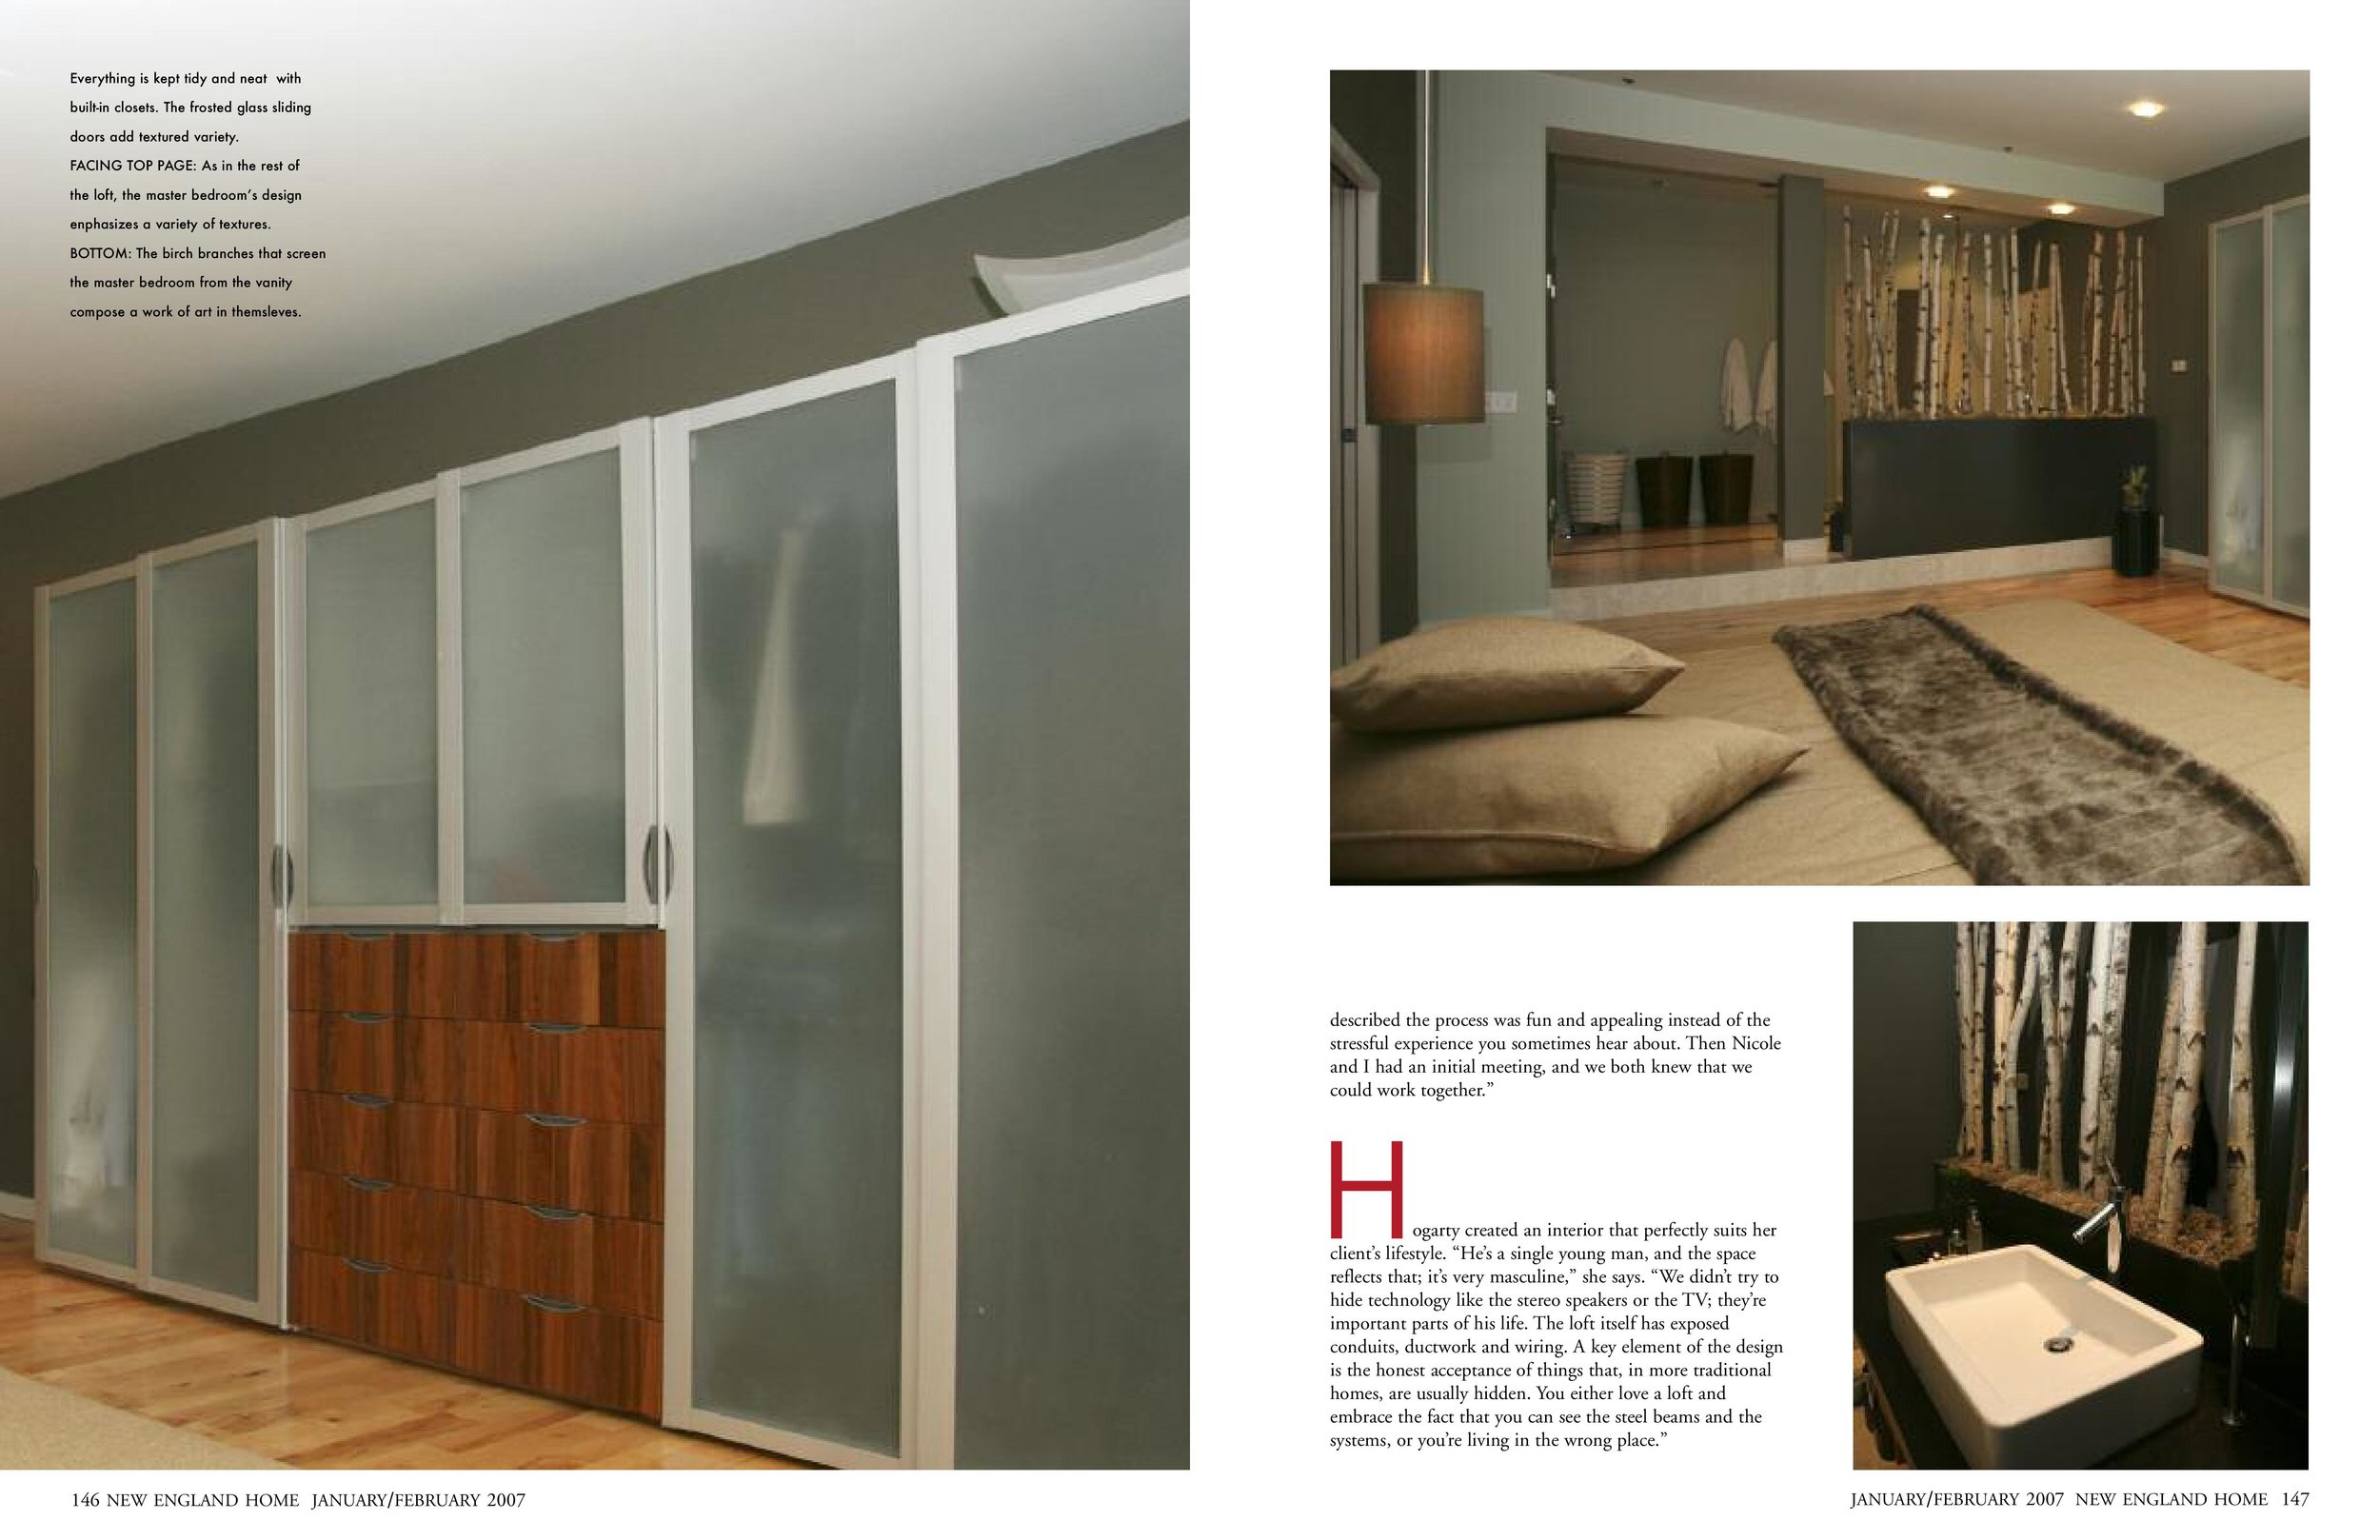 long-loft-love-page-004.jpg